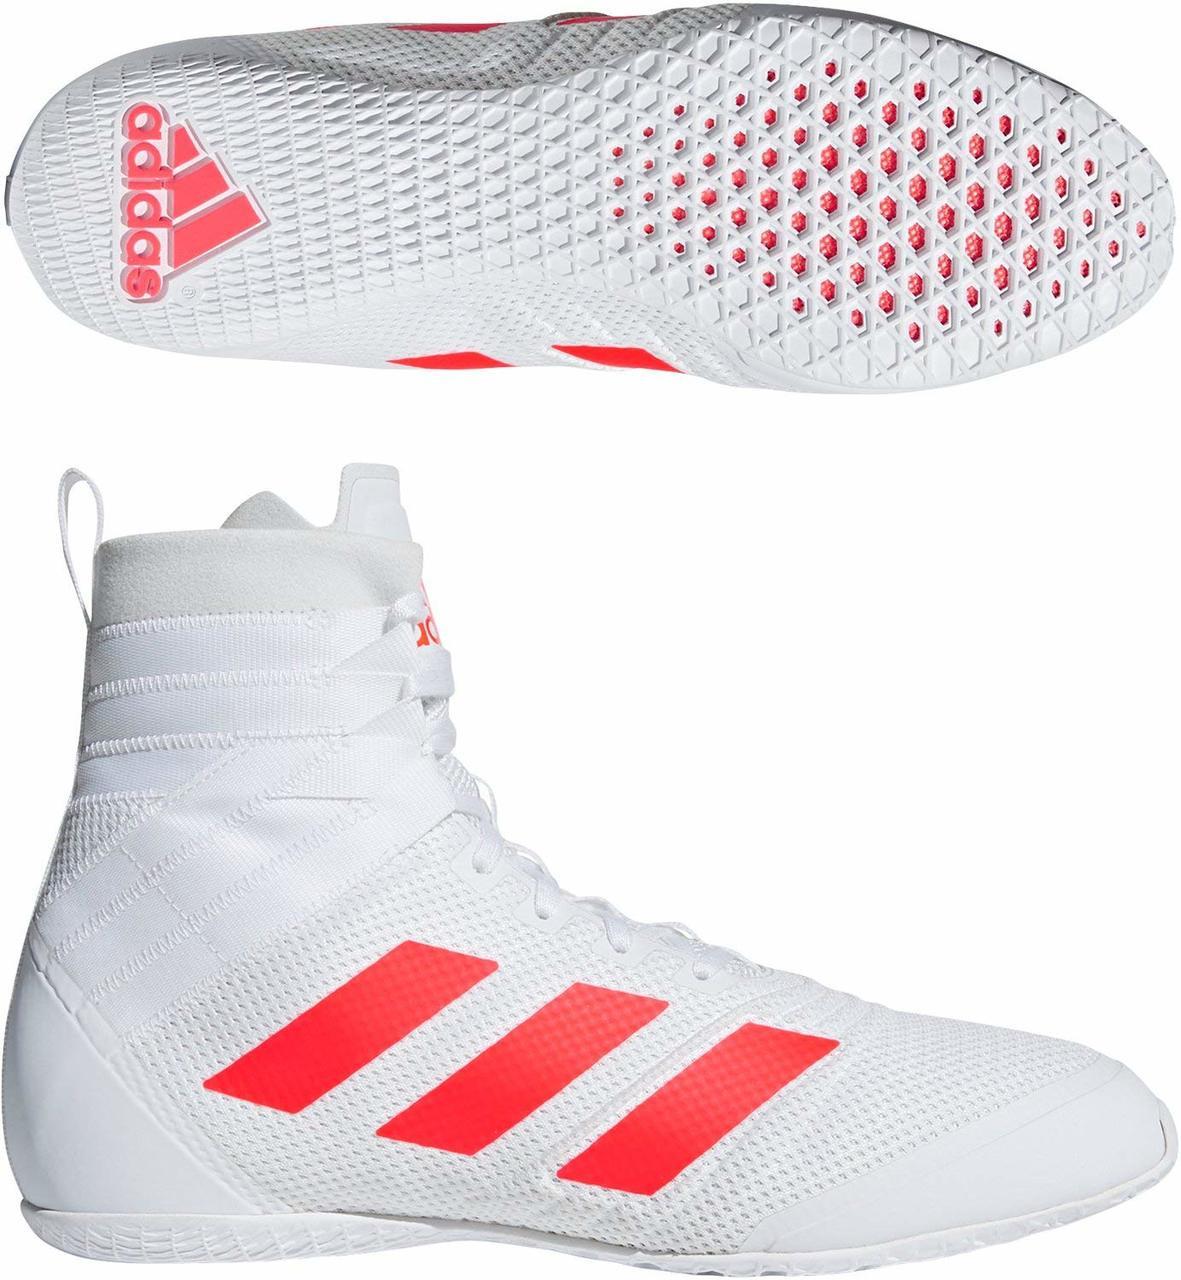 Adidas Speedex 18 White Boxing Boots